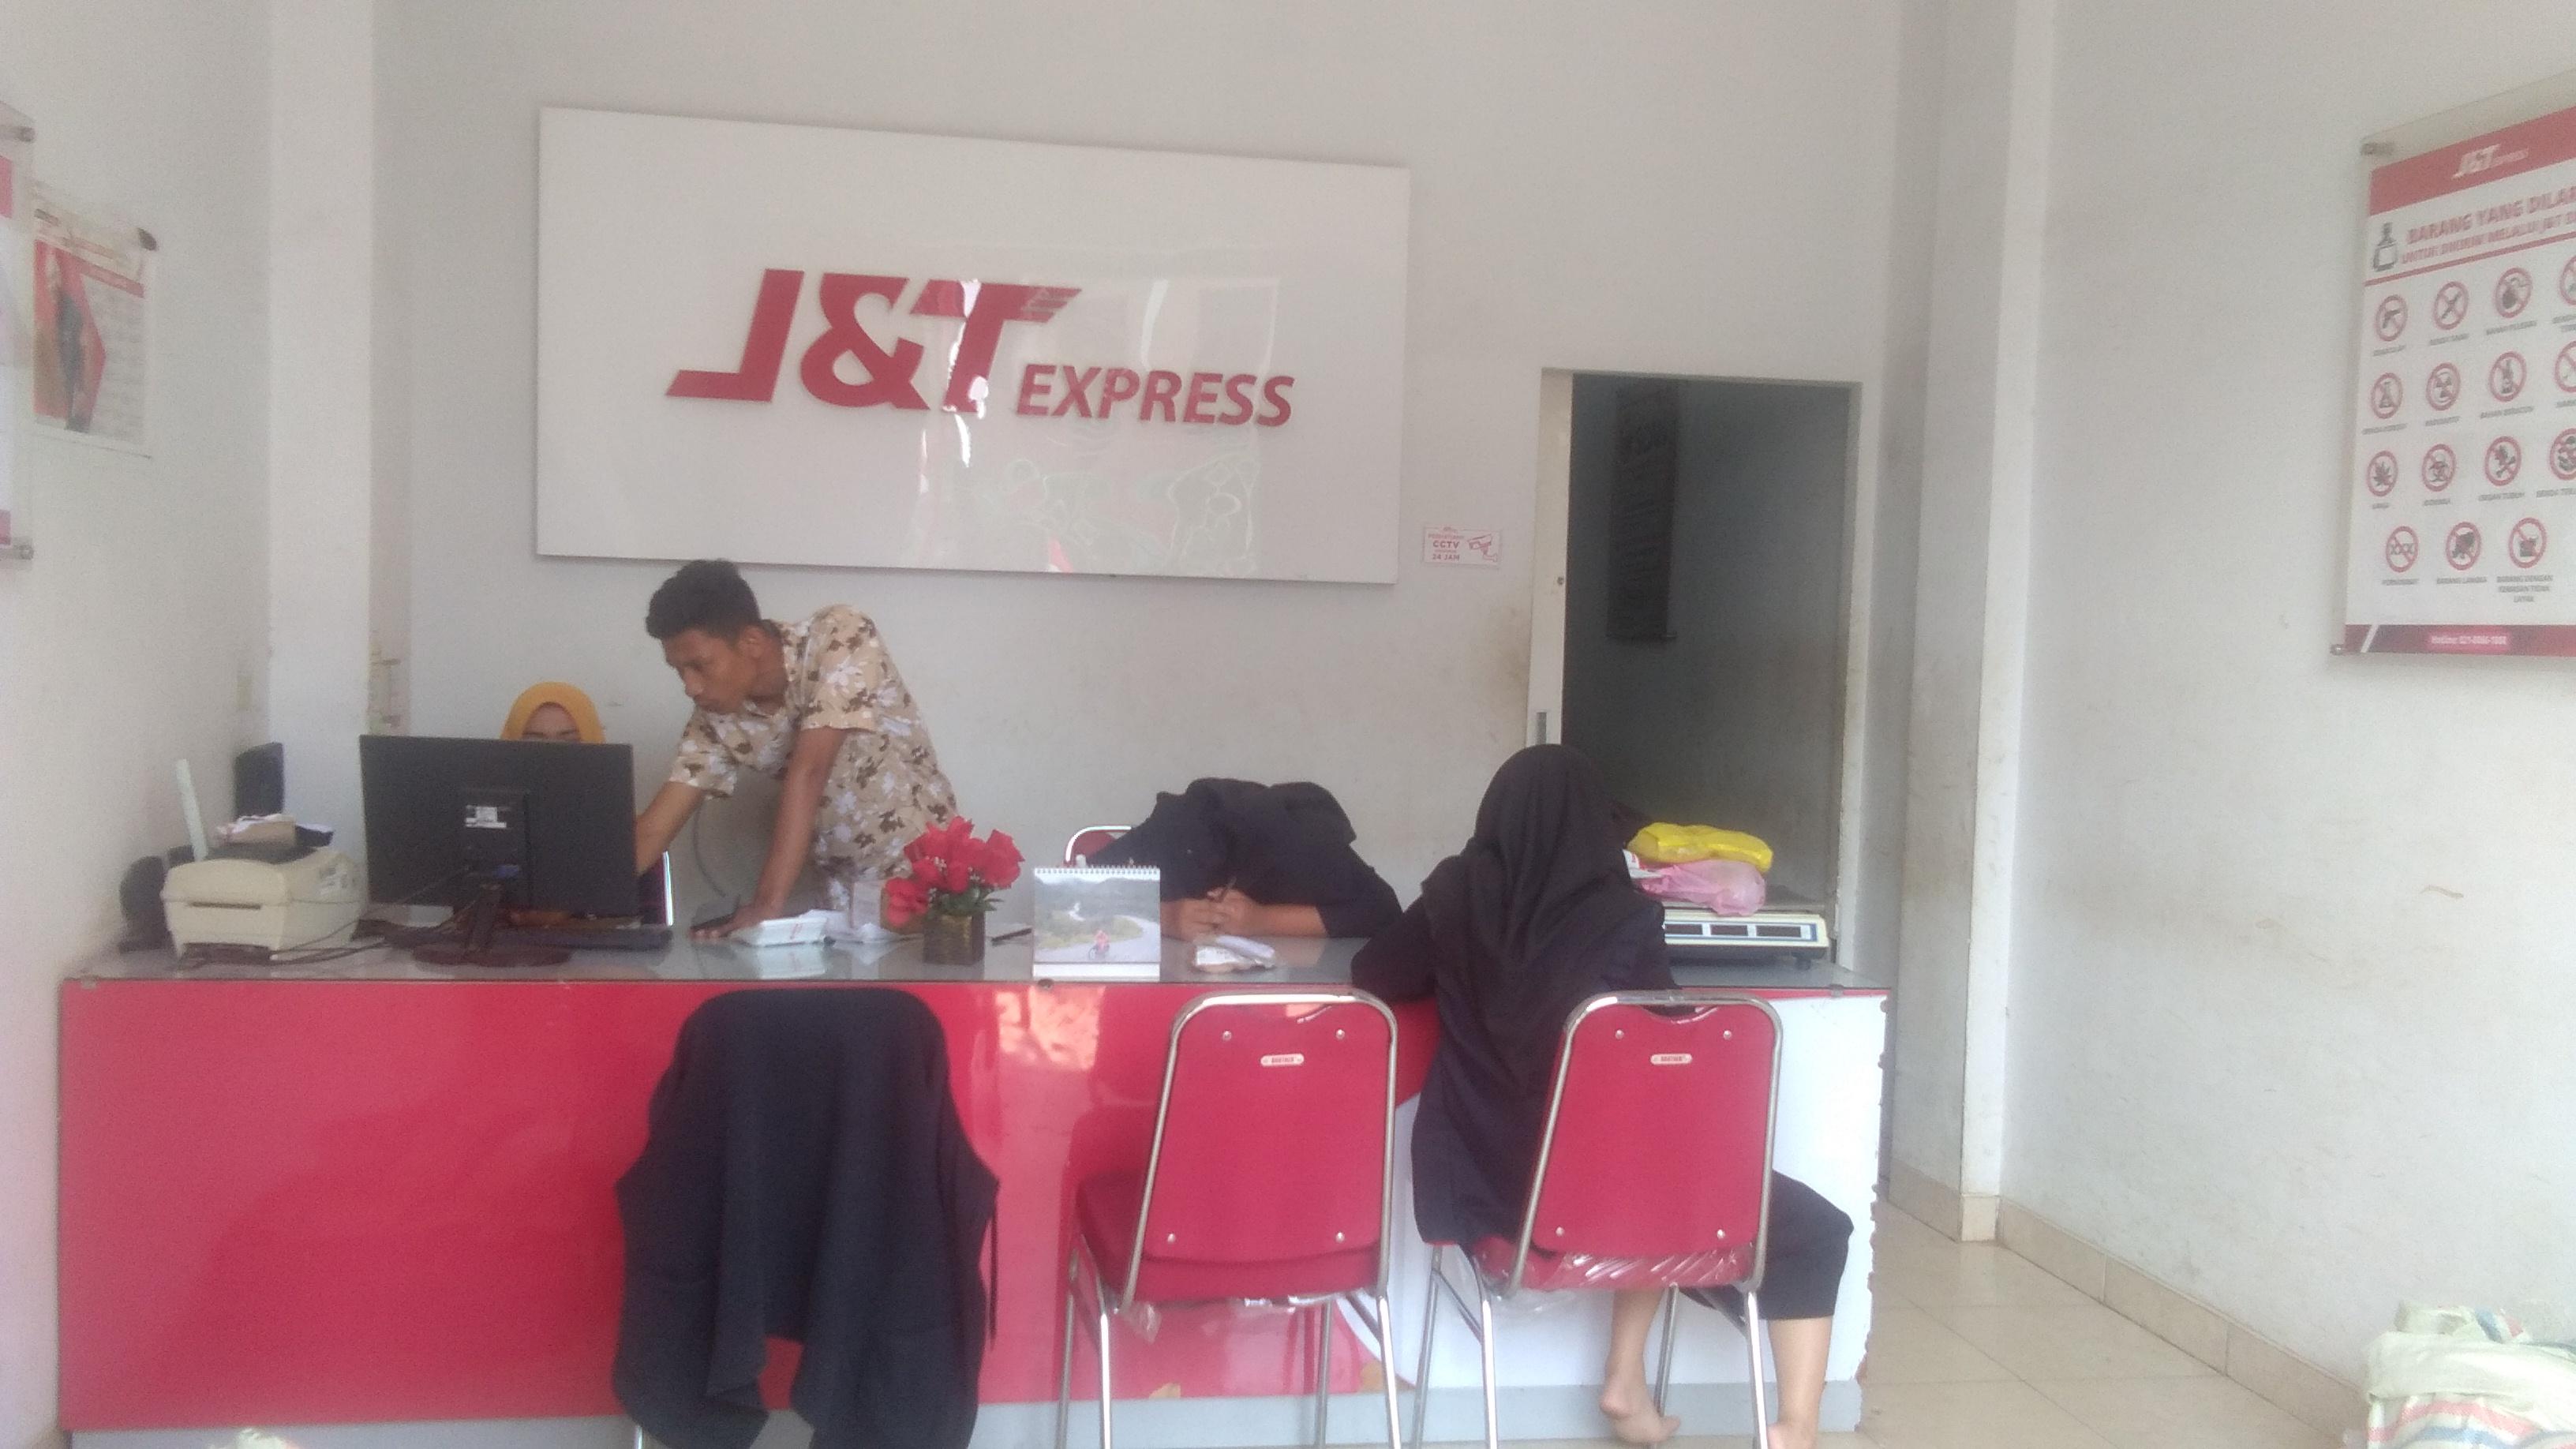 Kantor Media Online Bumi1 Com Keluhkan Lambatnya Jasa Pengiriman J T Express Bumi1